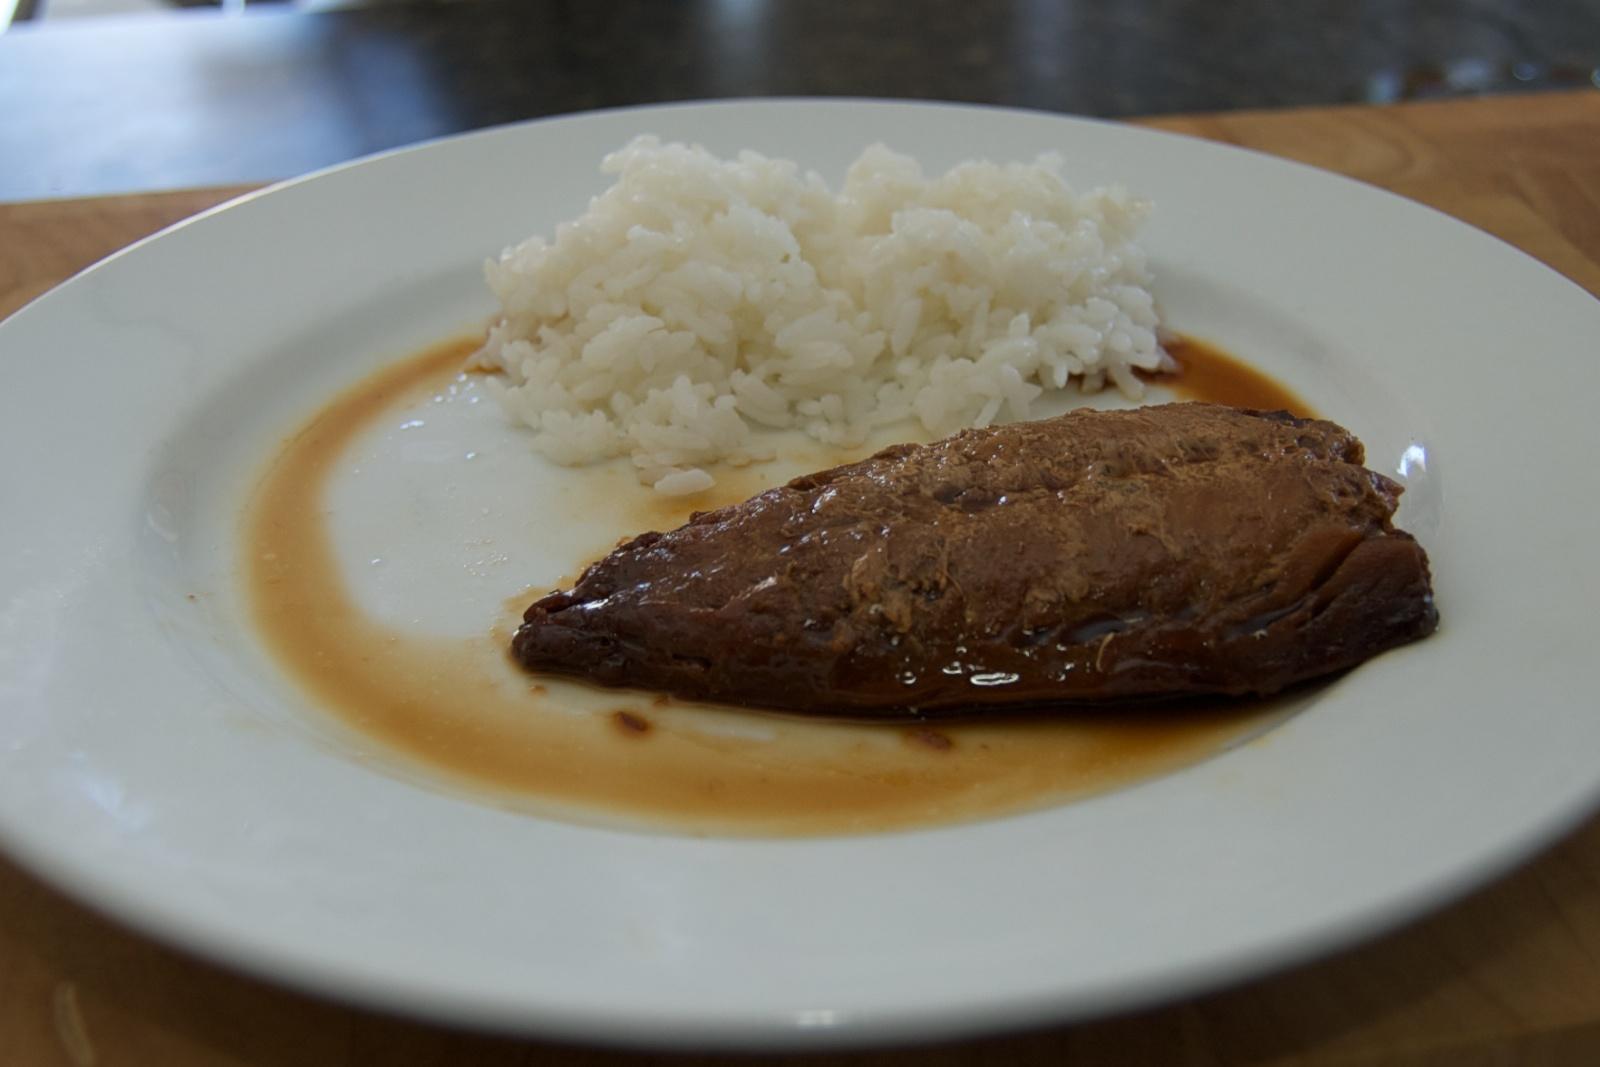 http://blog.rickk.com/food/2010/11/14/ate.20101114.l.jpg